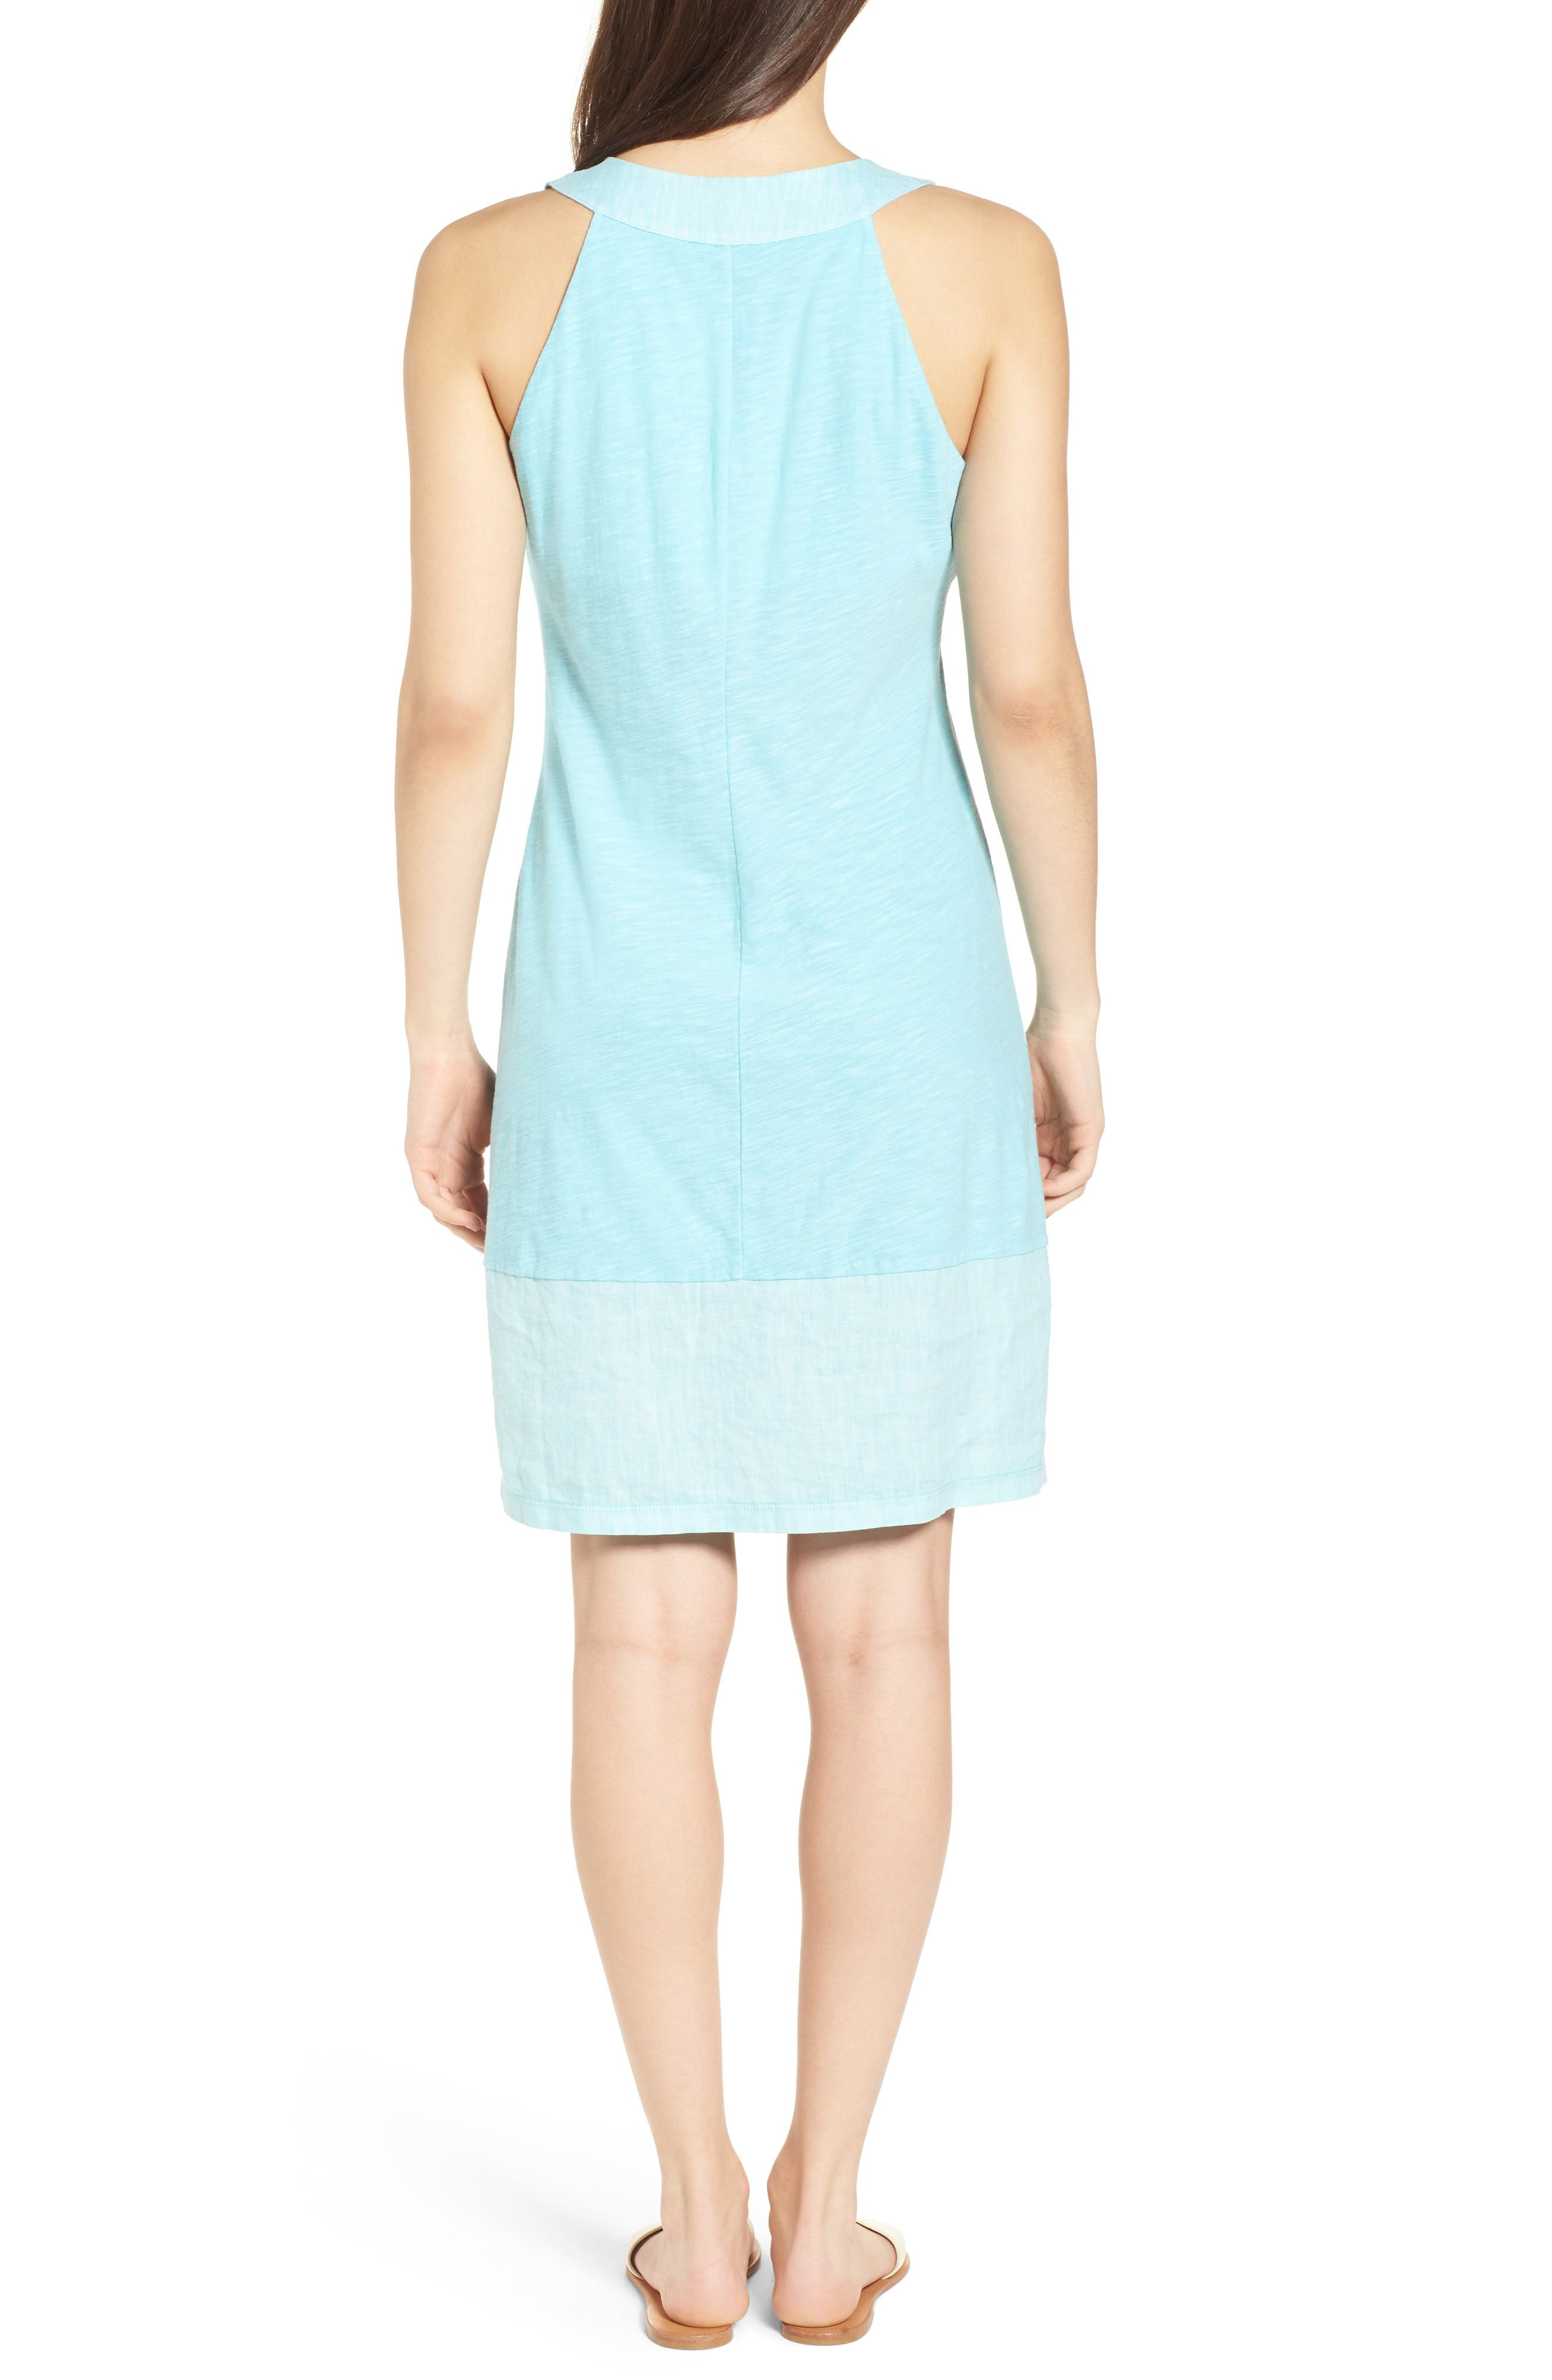 Arden Shift Dress,                             Alternate thumbnail 2, color,                             BLUE RADIANCE